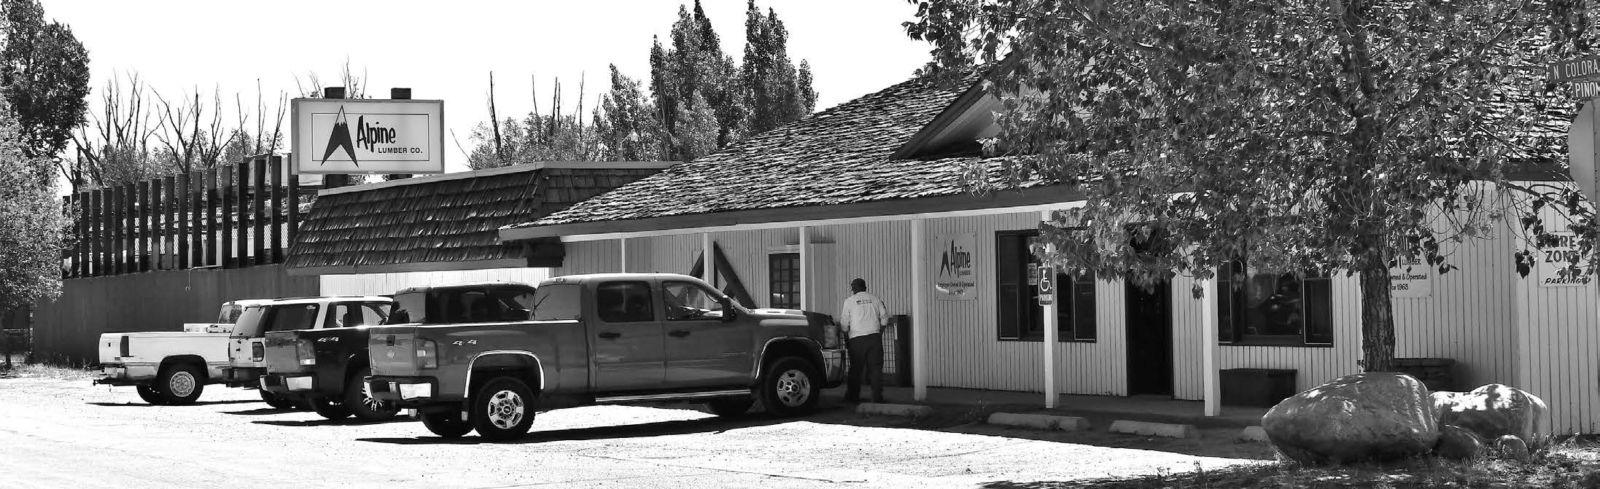 Alpine Lumber storefront